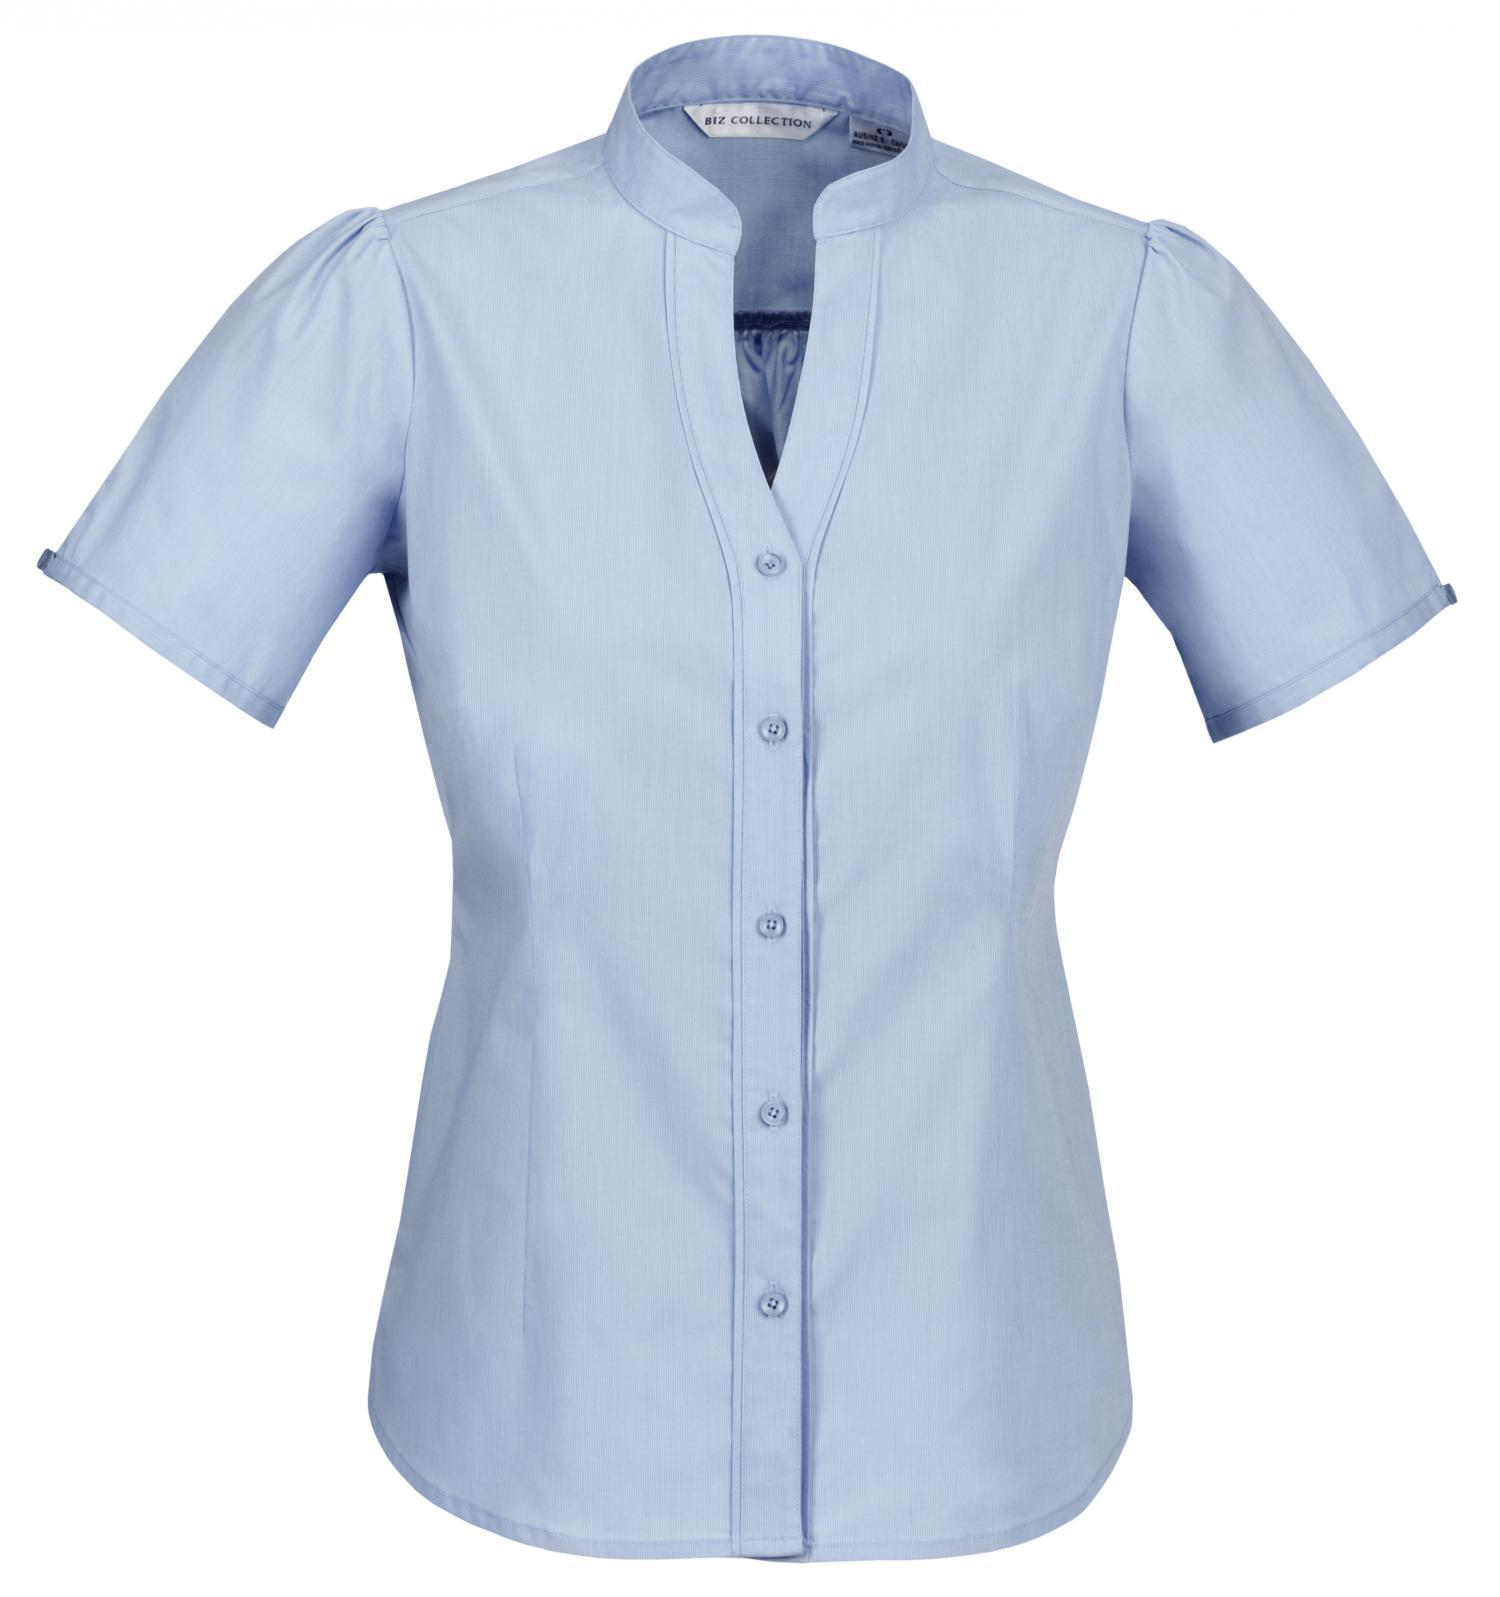 Ladies Chevron Up Collar Shirt Business Shirts The